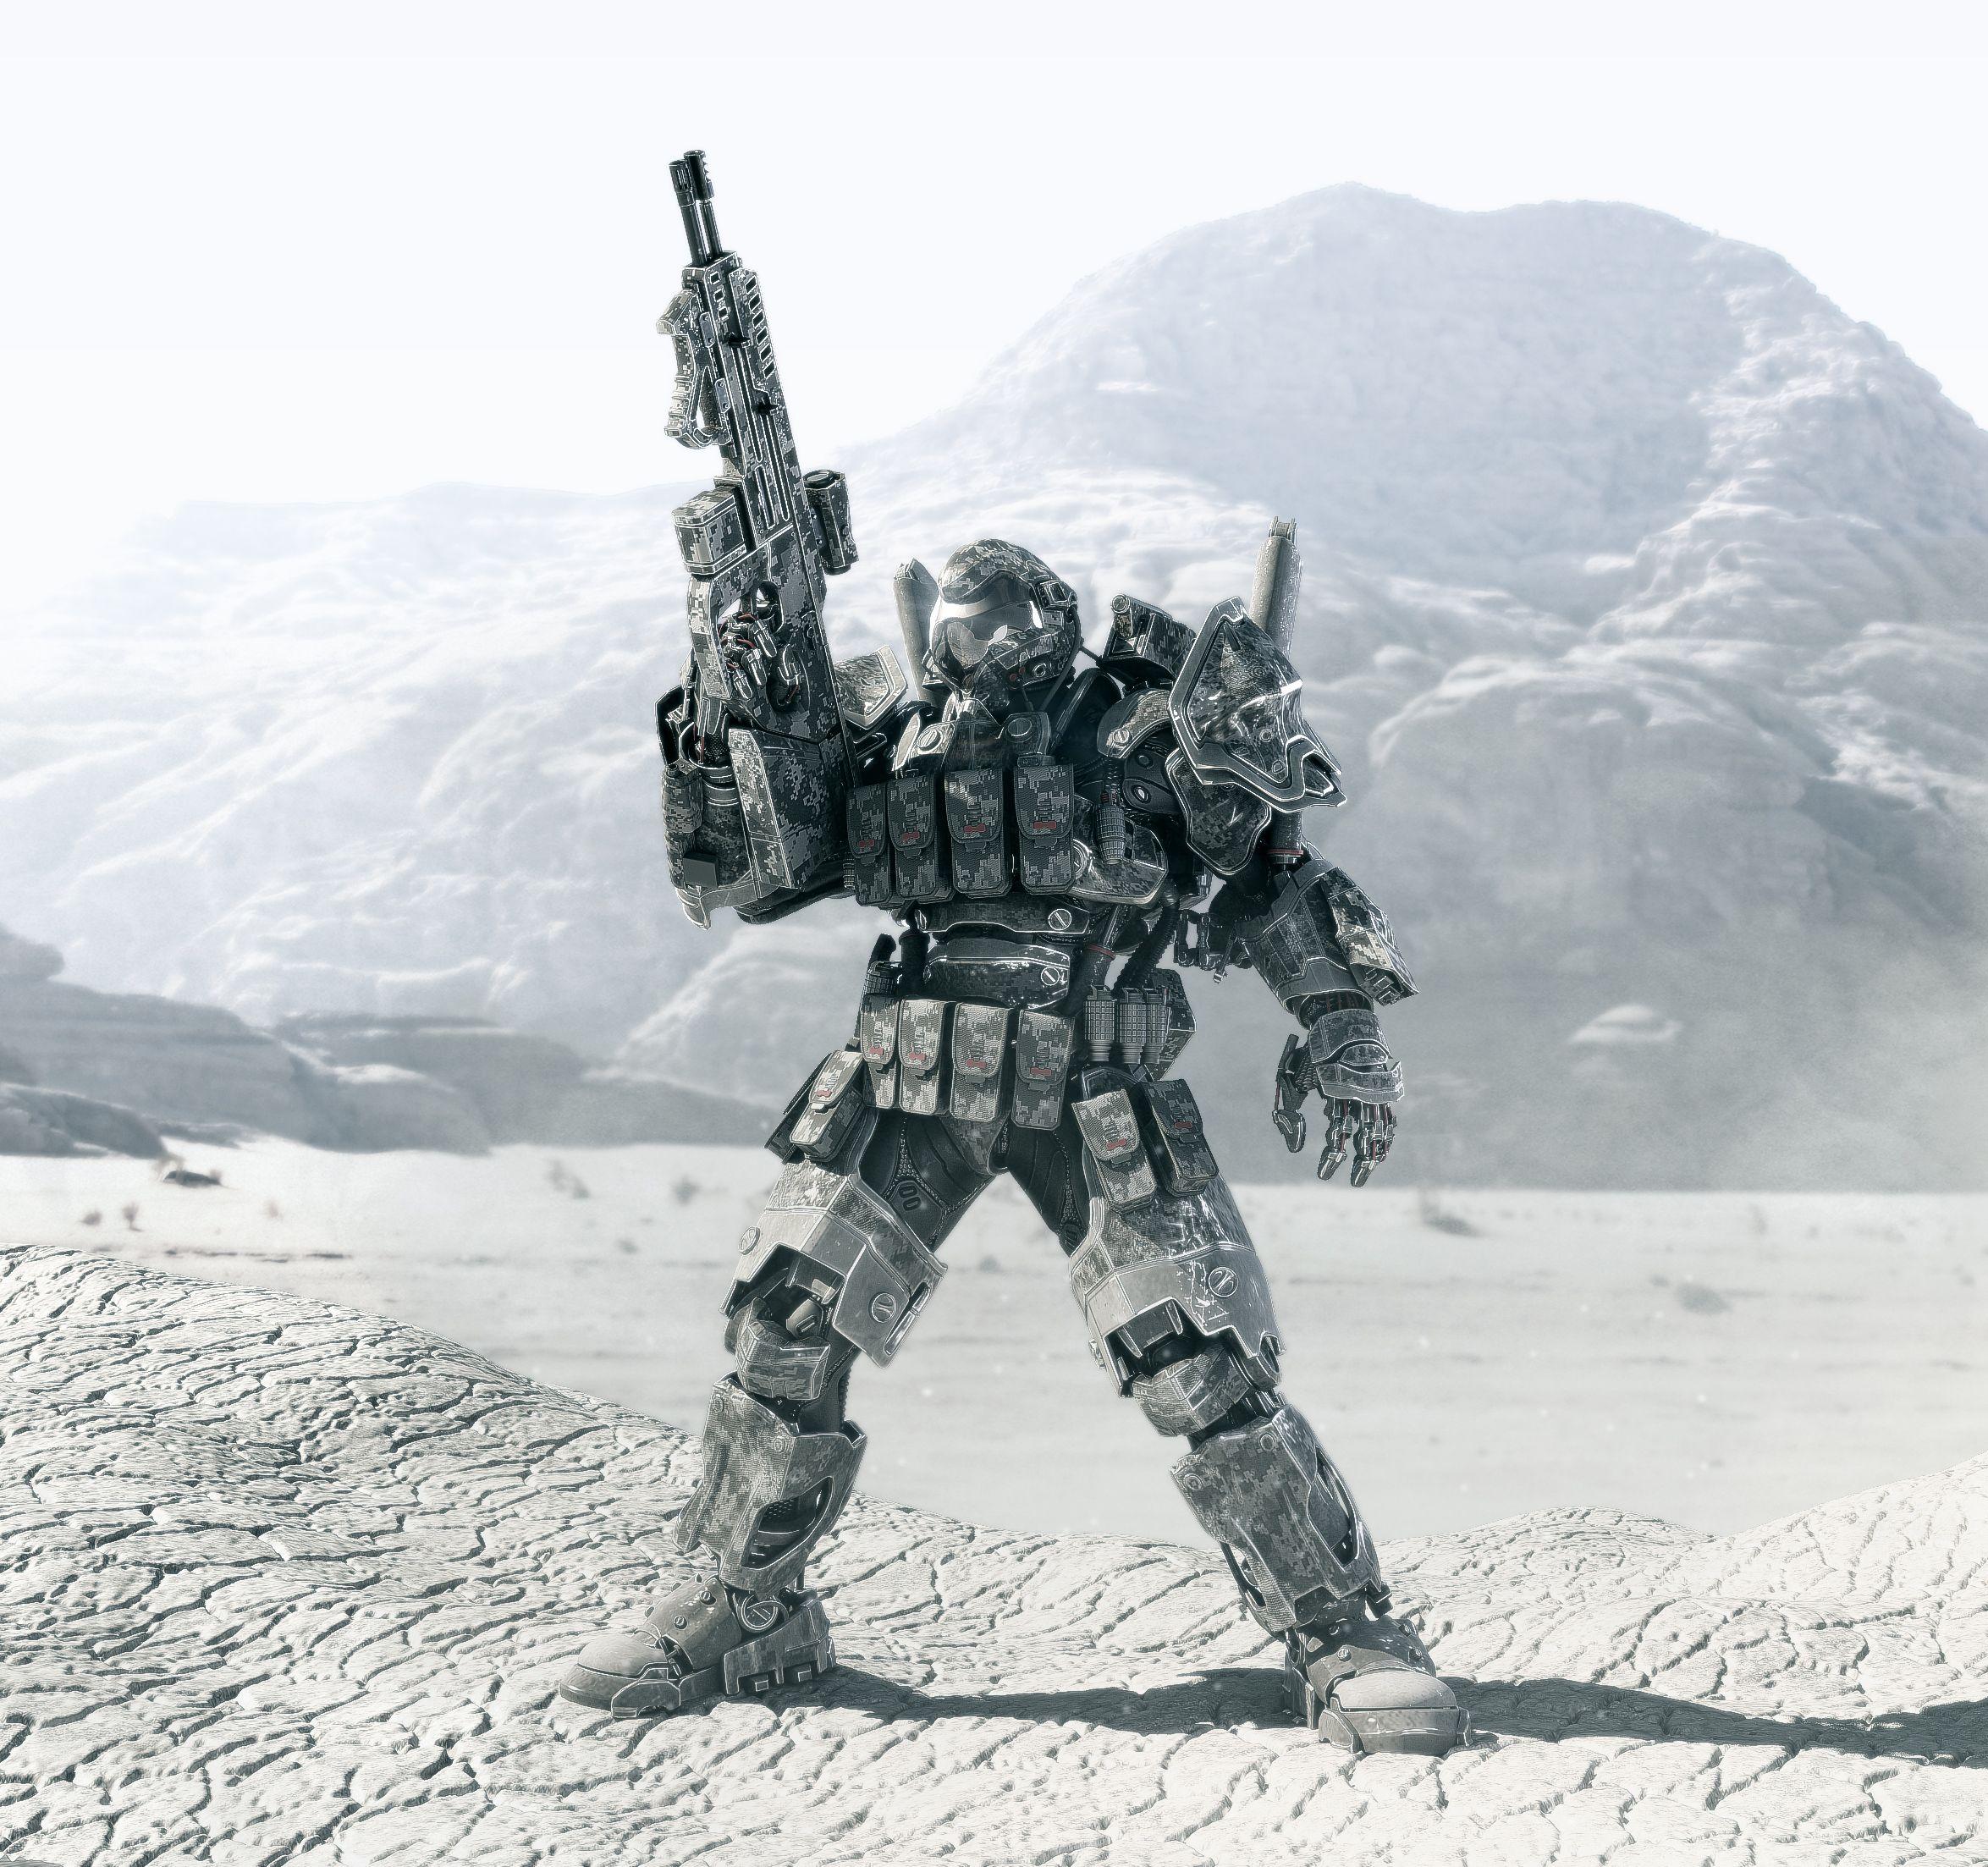 super soldier code name Chimera final render WIP 1 by Avitus12.deviantart.com on @deviantART